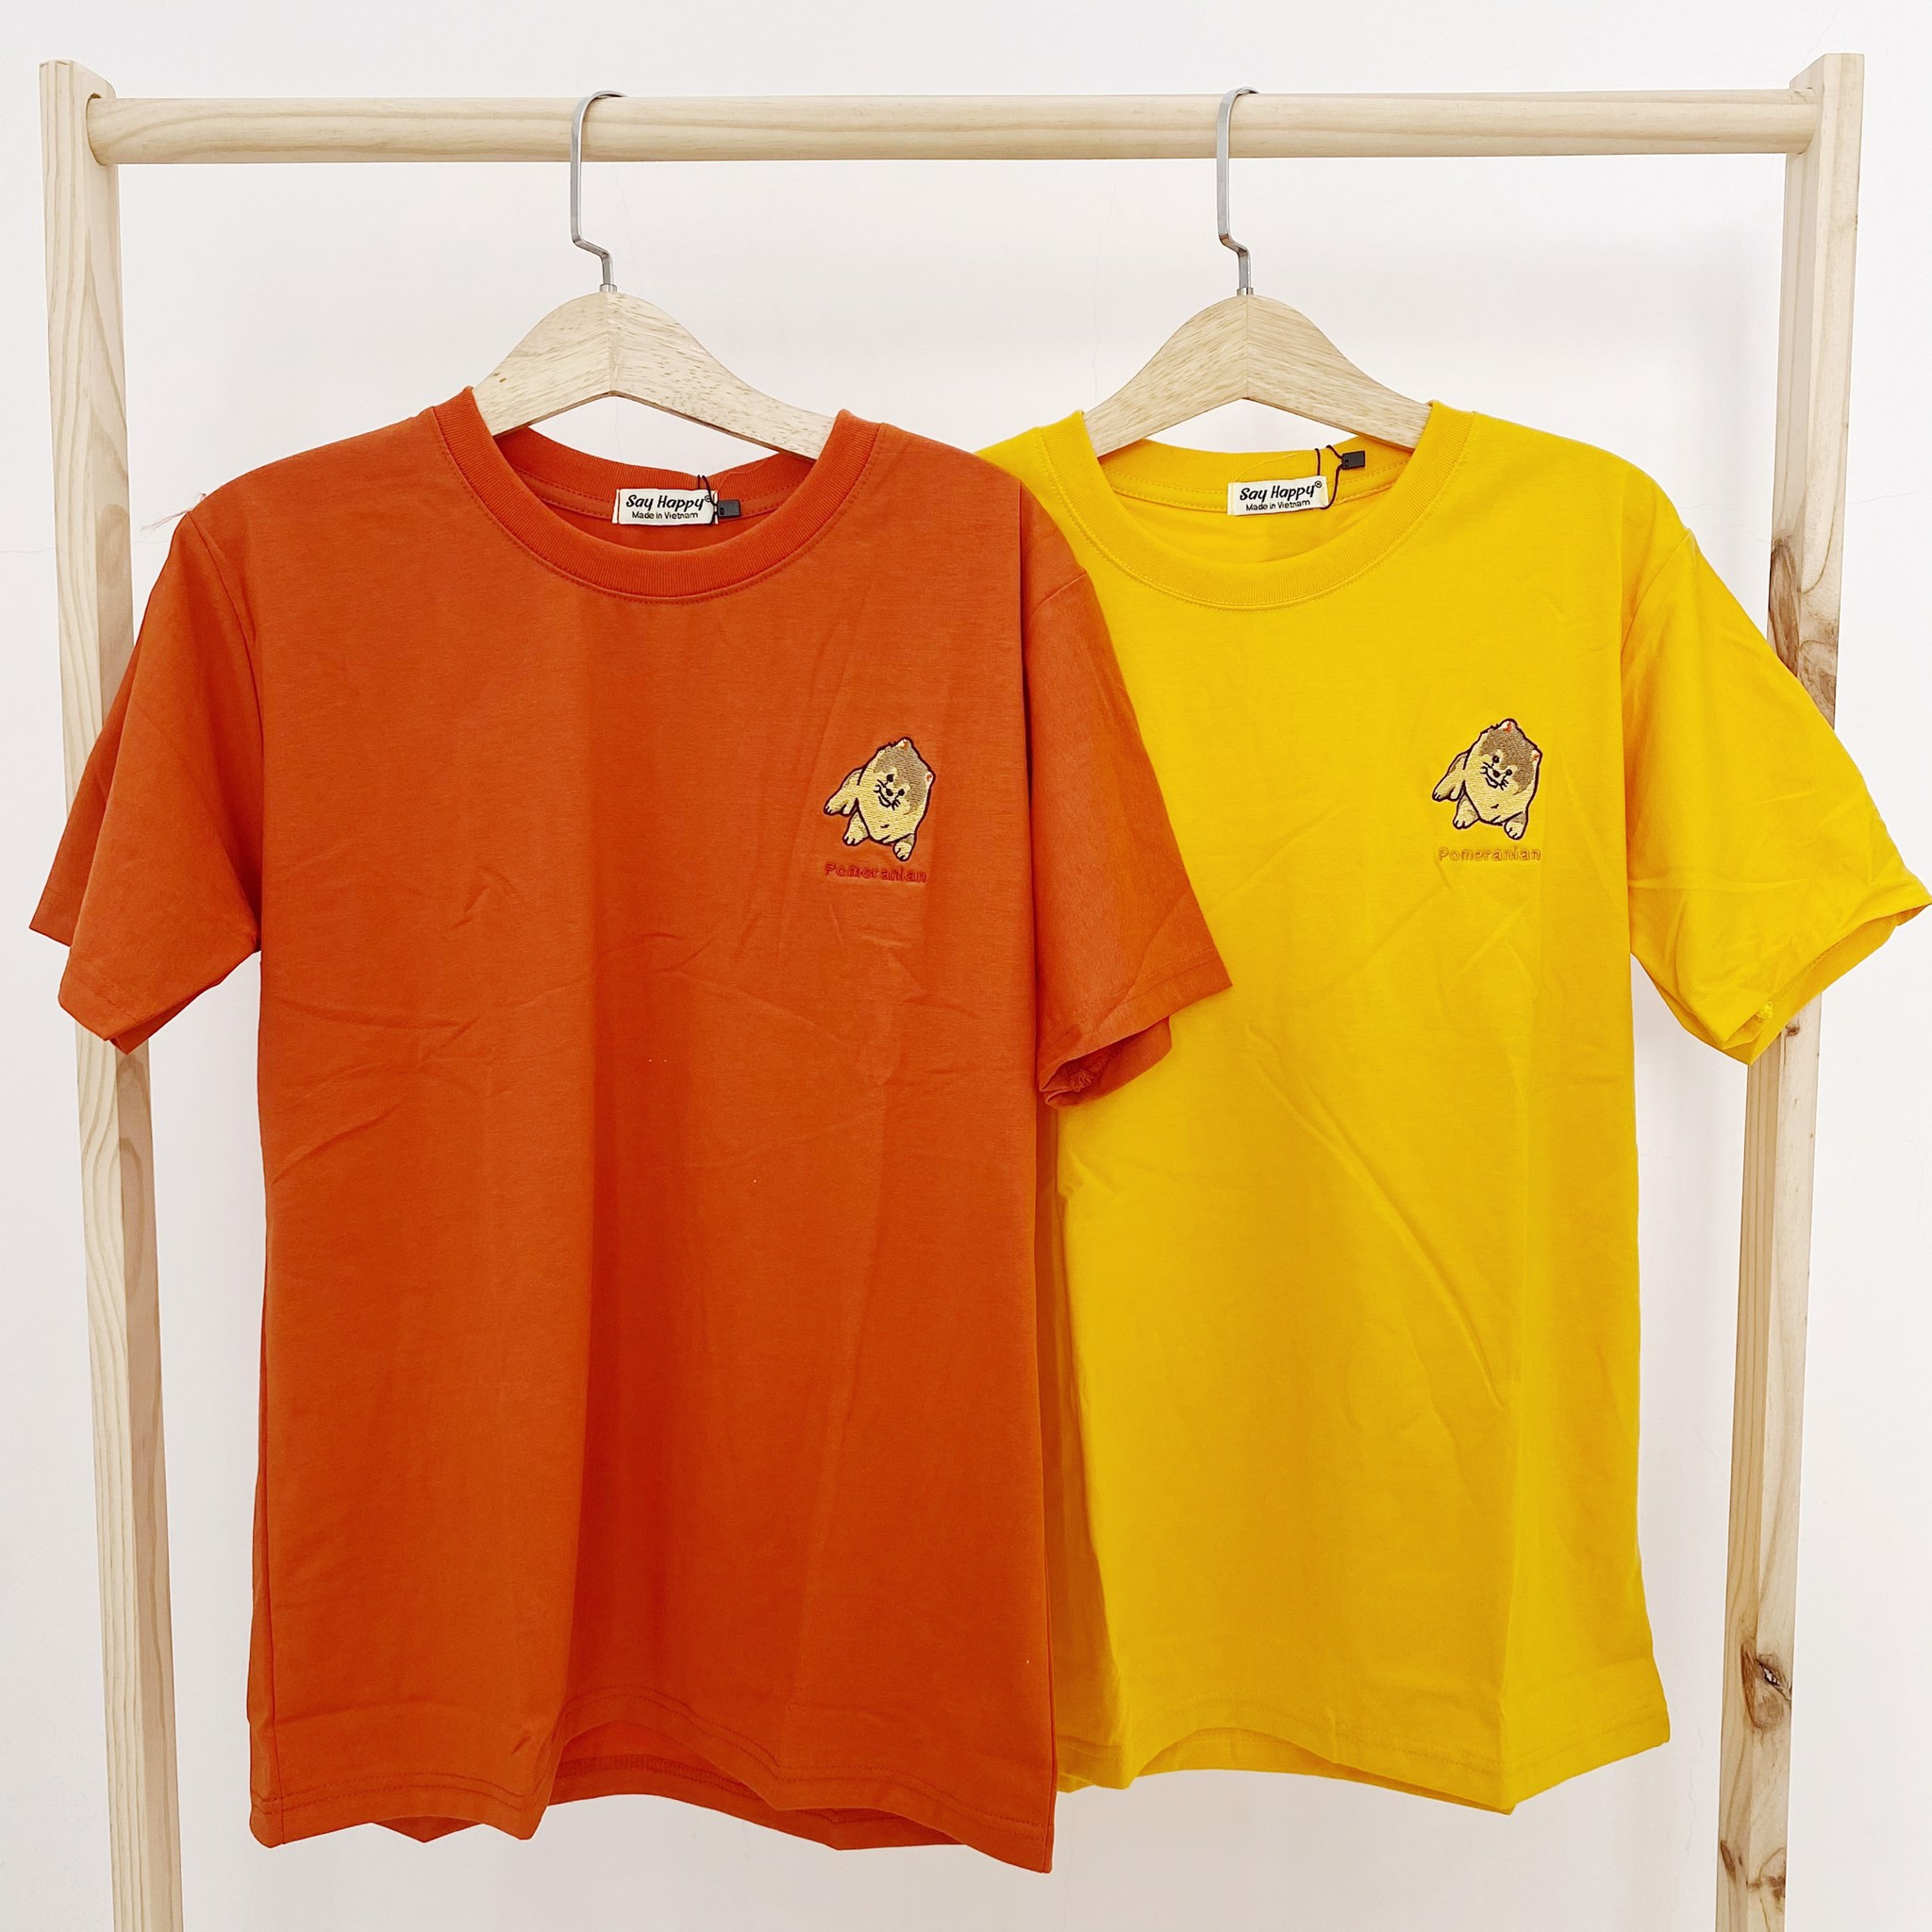 Say Happy Tshirt - Áo thun cam form medium thêu